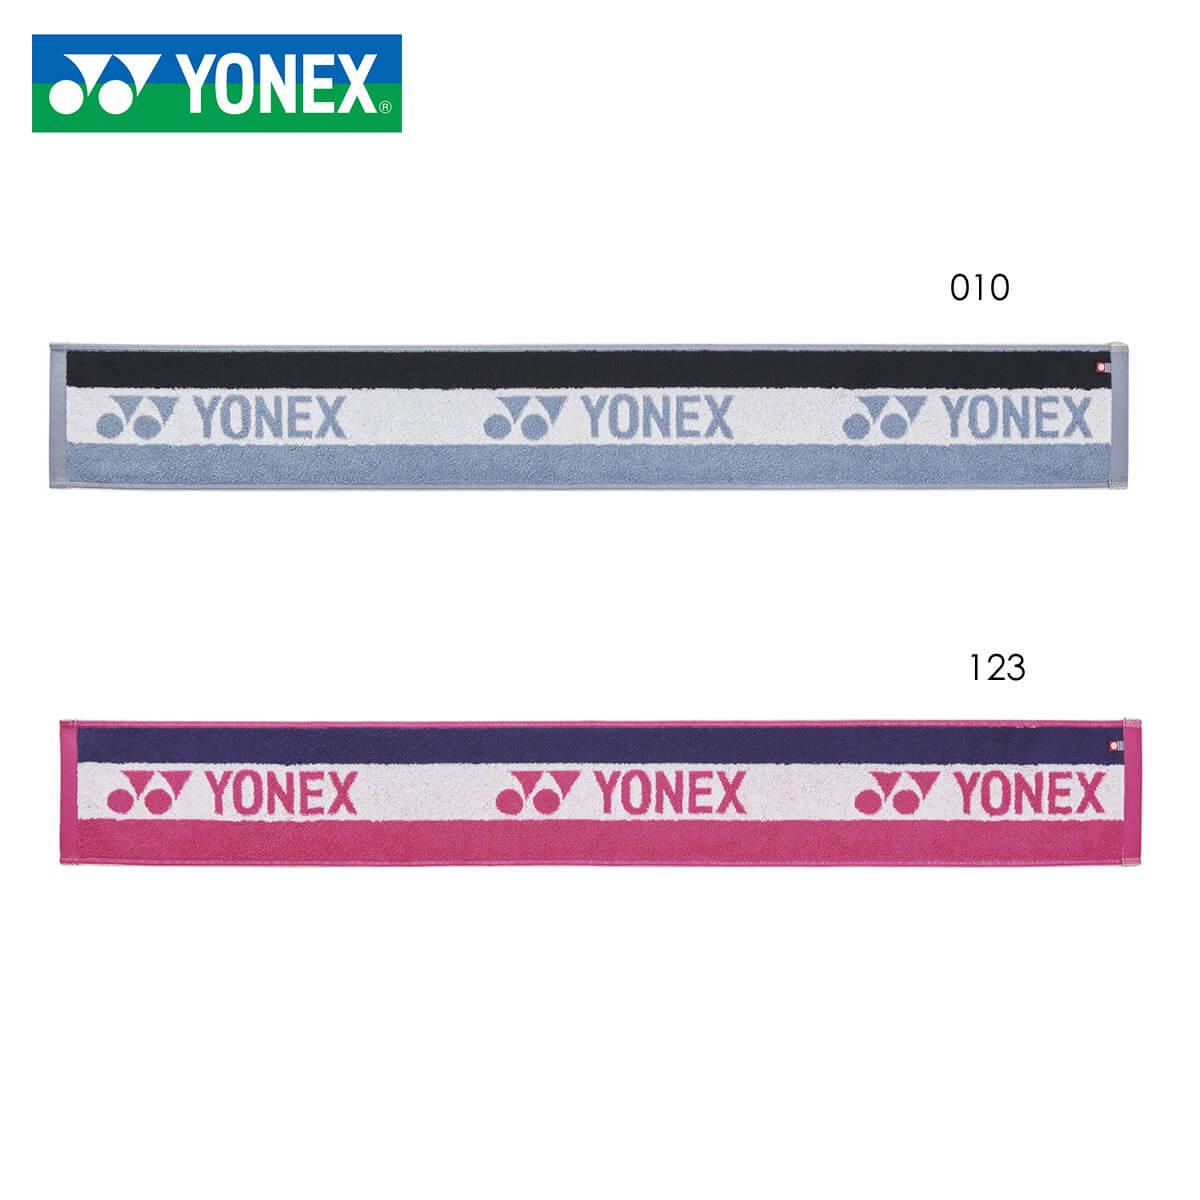 YONEX AC1076 マフラータオル アクセサリー 永遠の定番モデル バドミントン テニス 取り寄せ 数量は多 2021FW ヨネックス